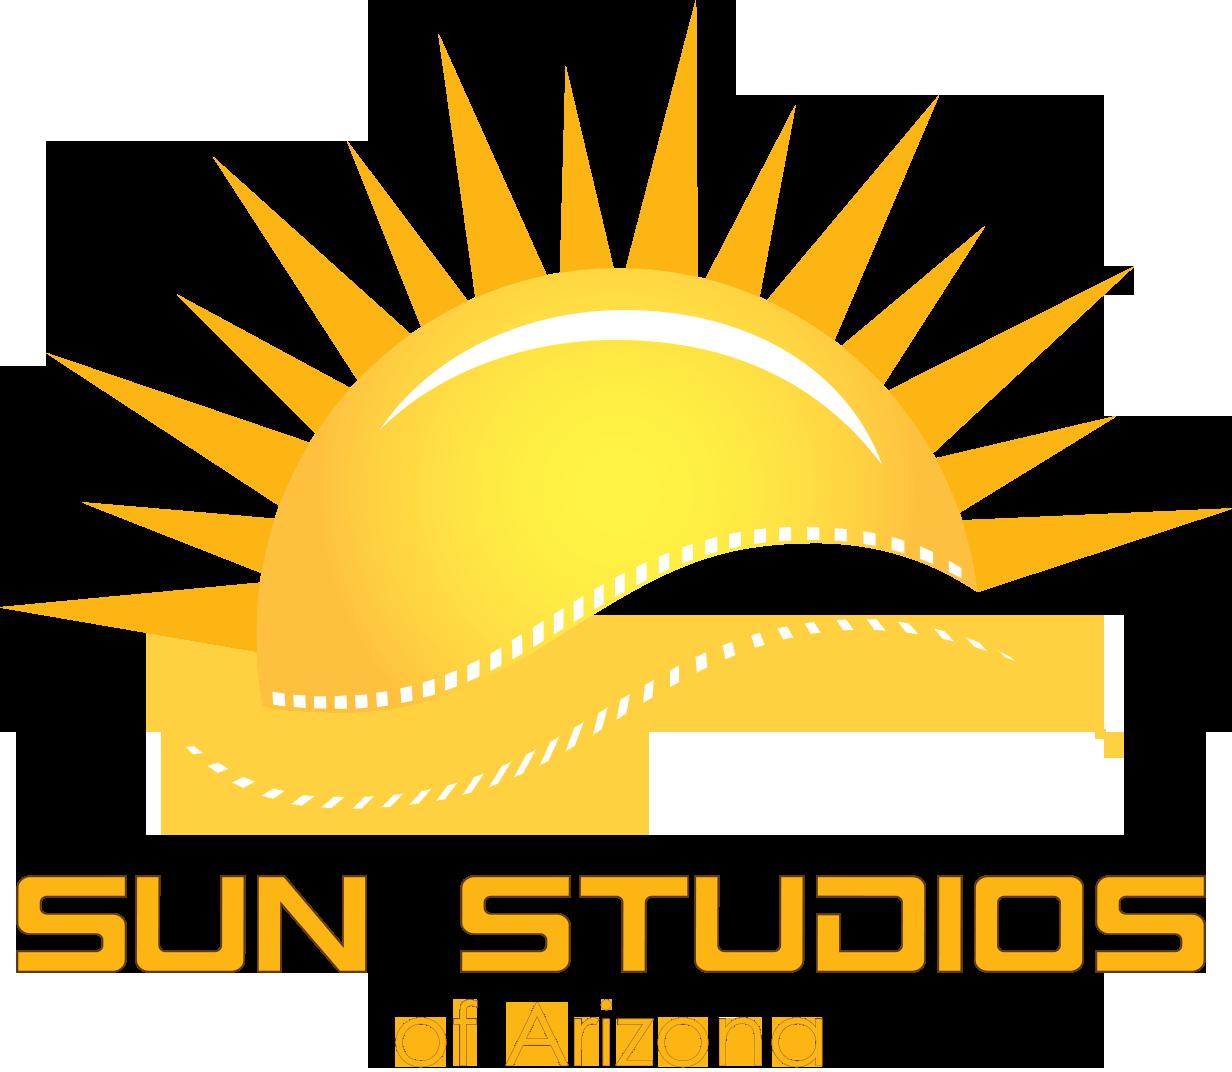 Clipart sun and sun gluses arizona clip art library SUN STUDIOS of Arizona clip art library